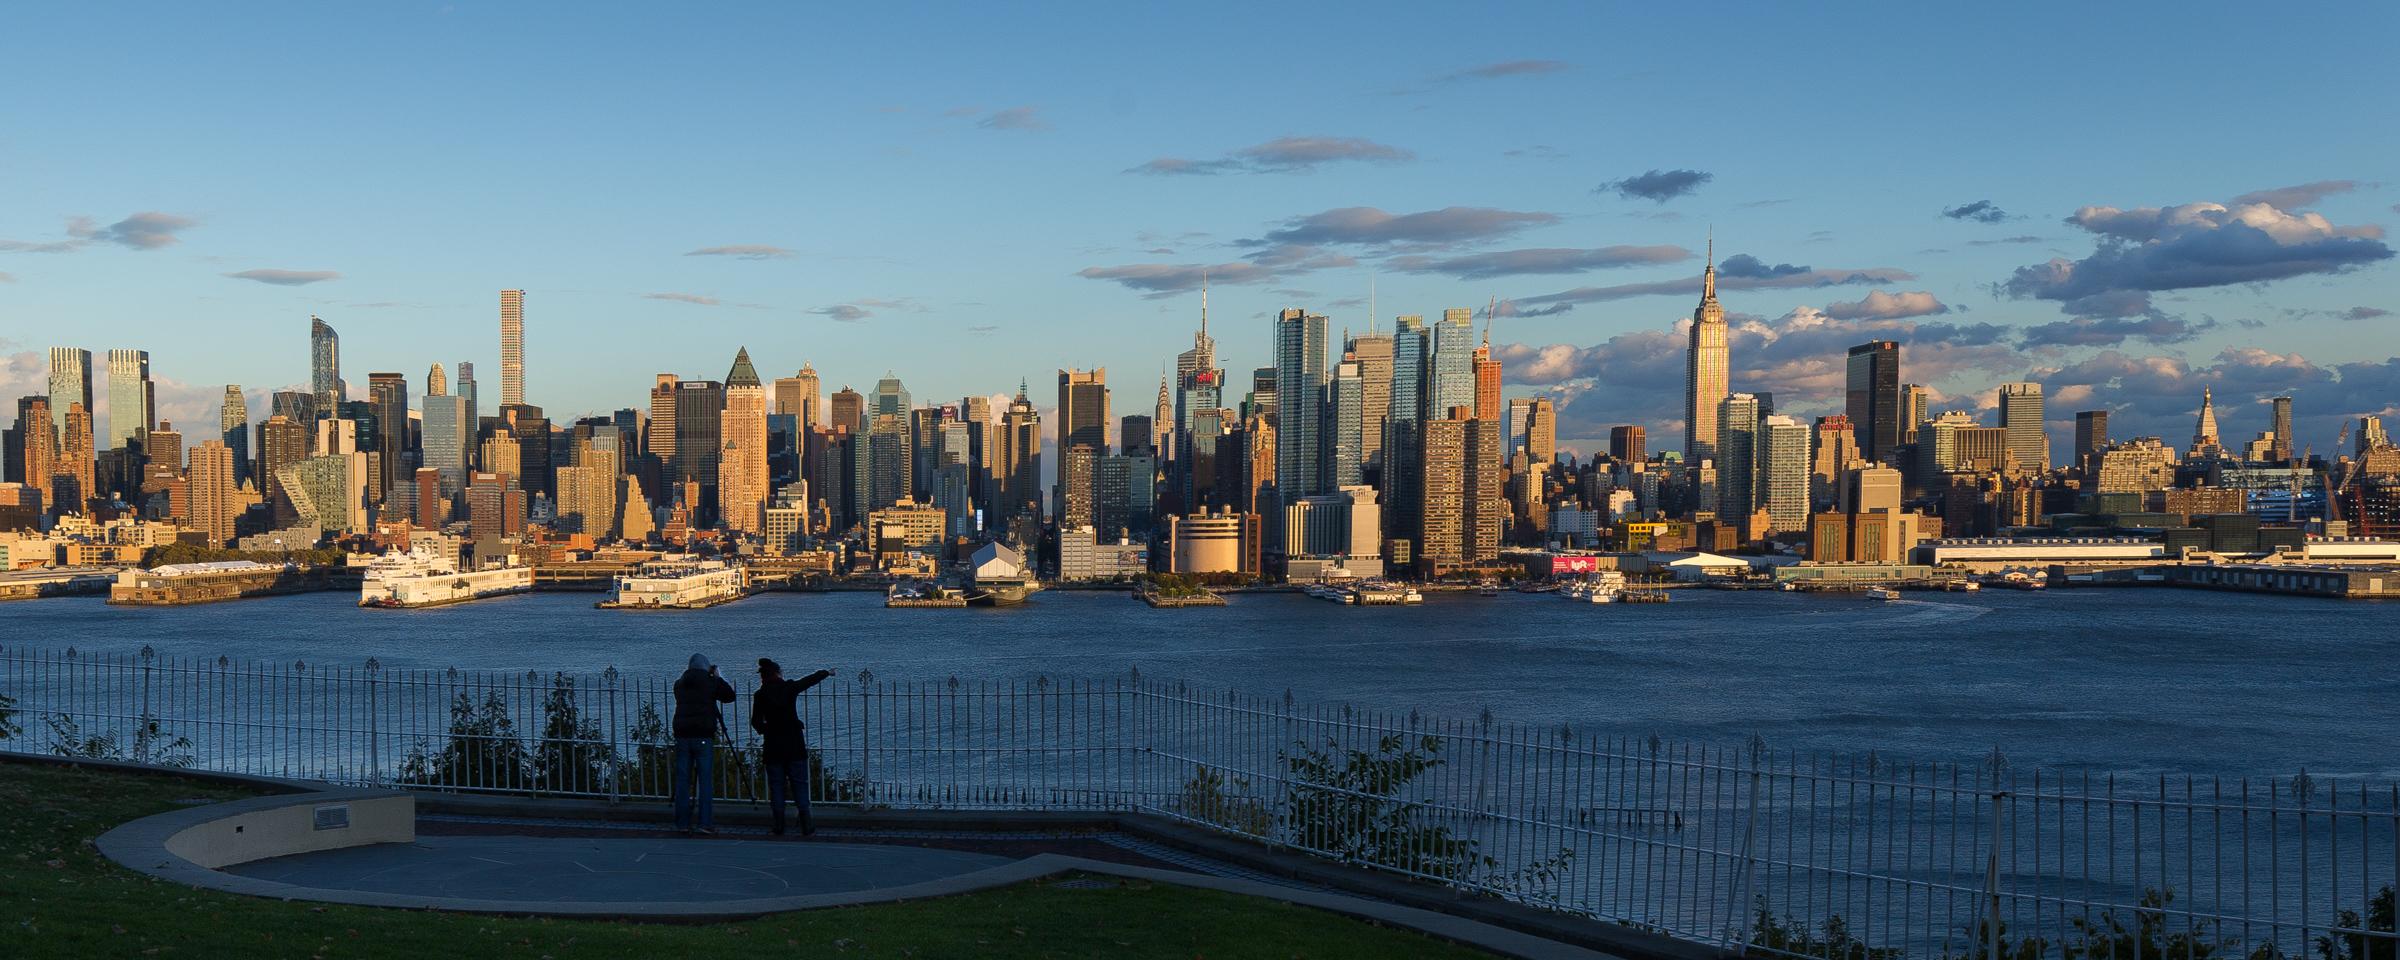 Liberty Near Me >> File:Hamilton Park, Weehawken, NJ- Manhattan, the Photographer and his Lady Friend Helper ...